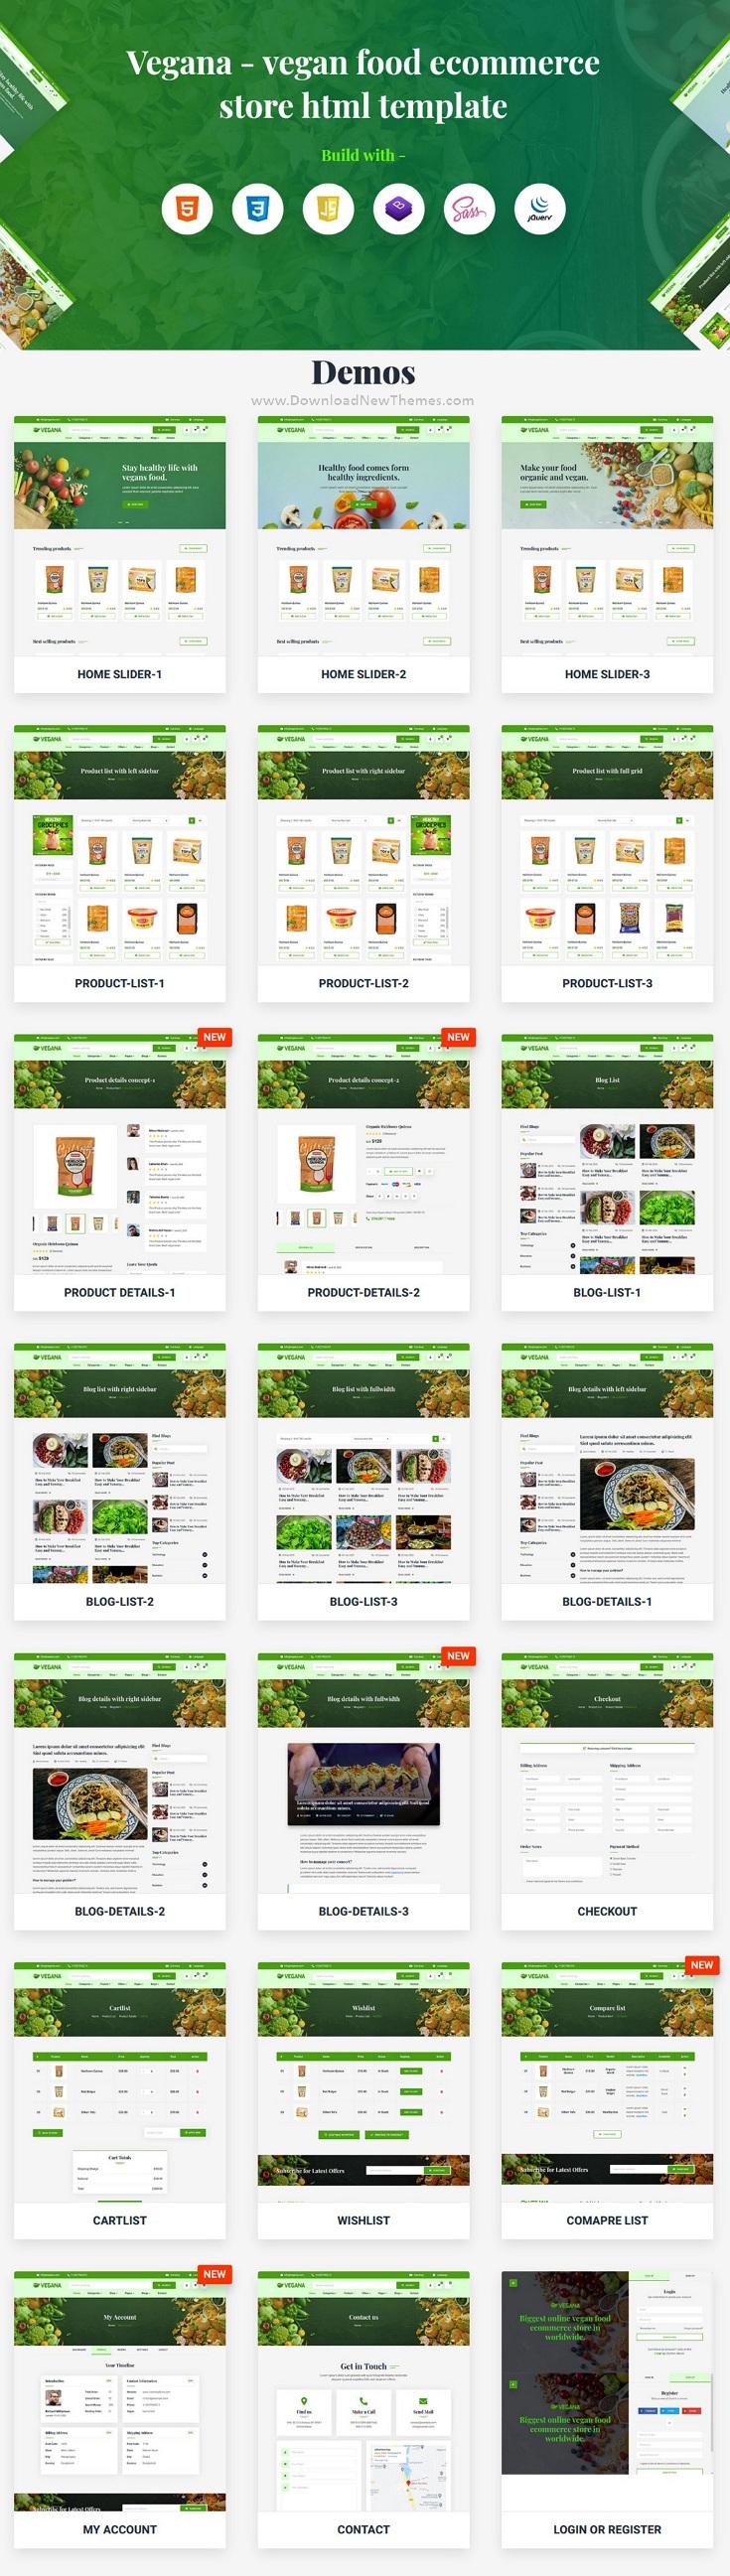 Vegan Food eCommerce HTML Template